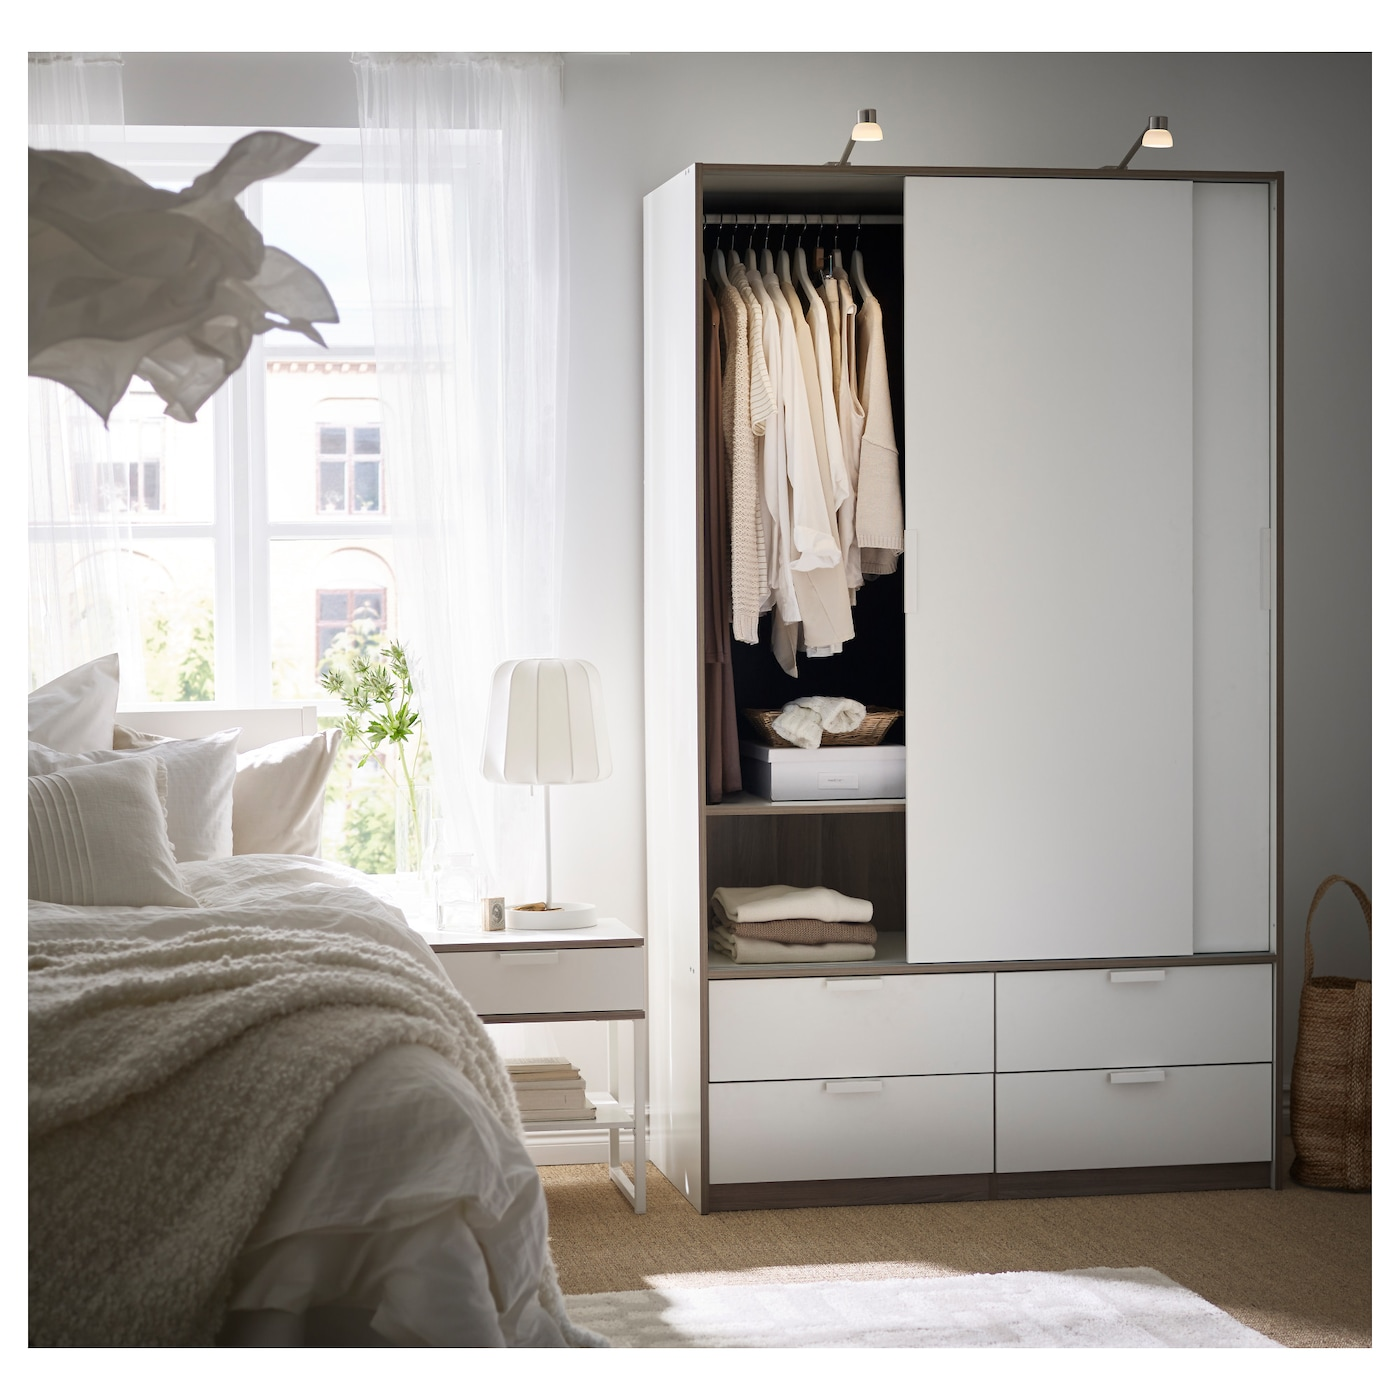 trysil kledingkast schuifdeuren 4 lades wit 118 x 61 x 202 cm ikea. Black Bedroom Furniture Sets. Home Design Ideas